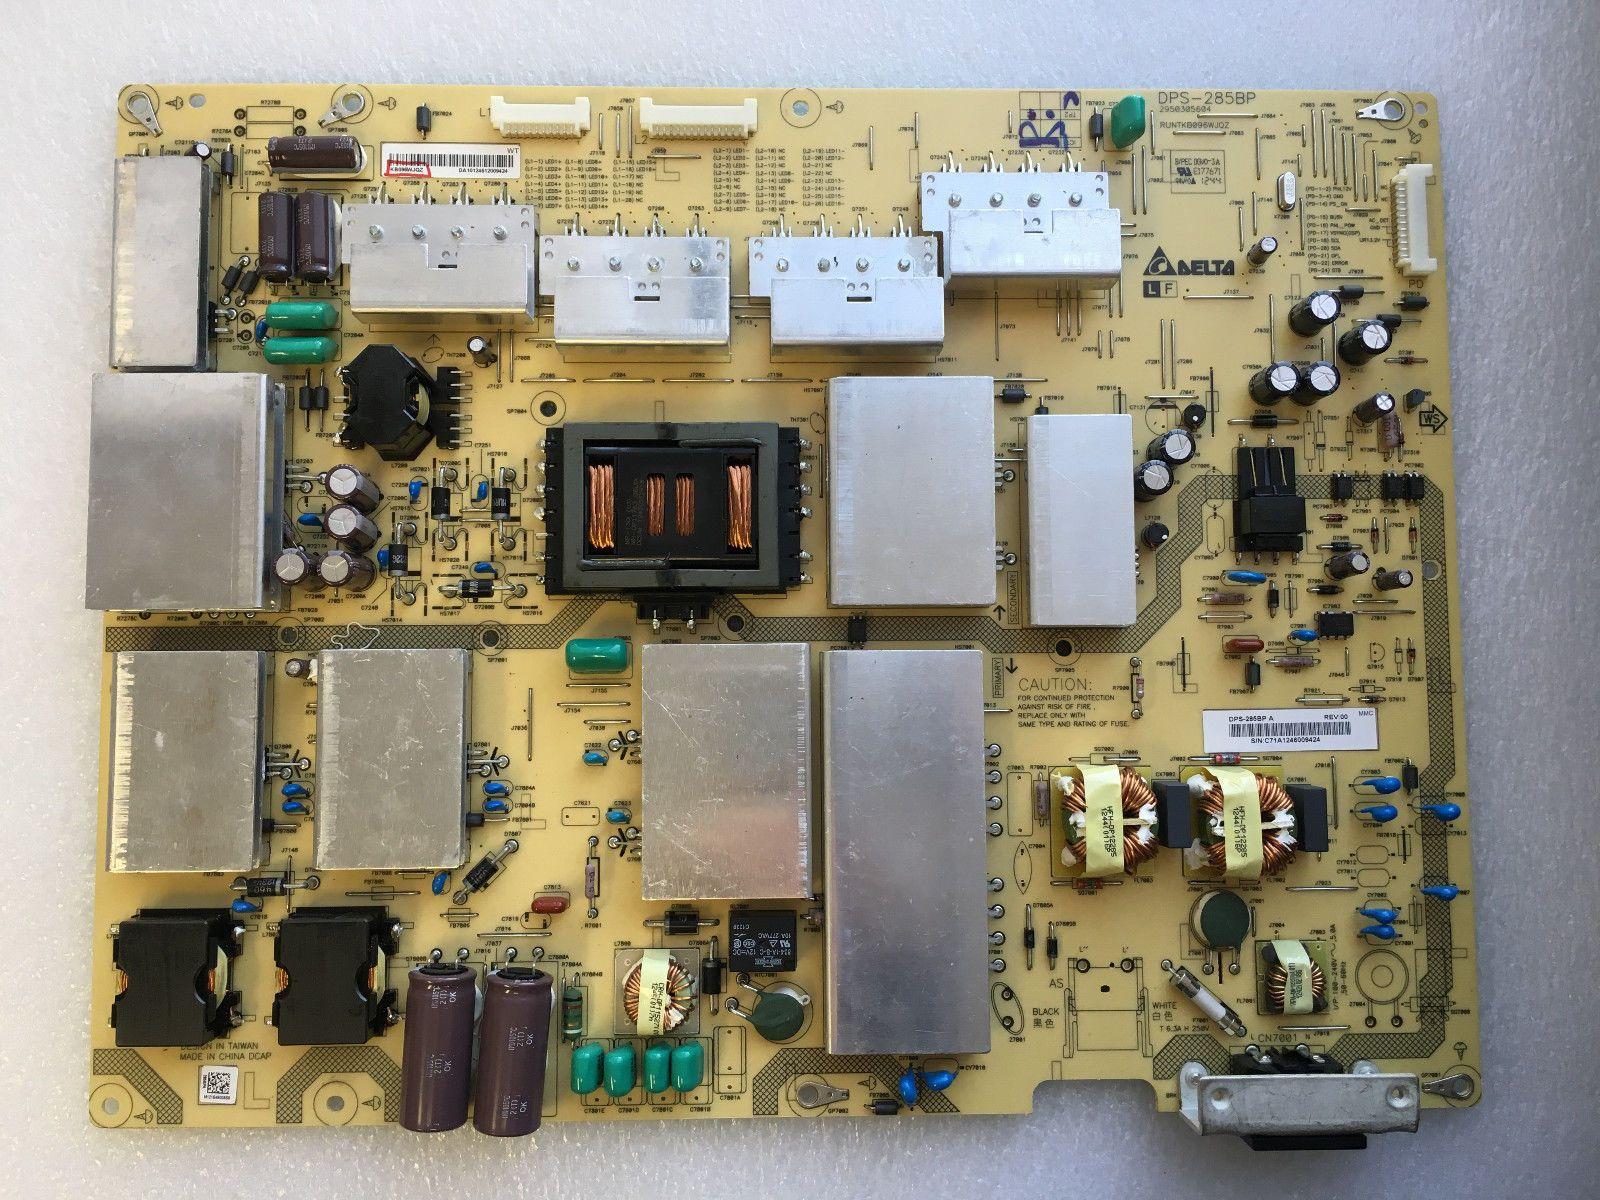 Sharp RUNTKB096WJQZ (DPS-285BP A) Power Supply LED Board